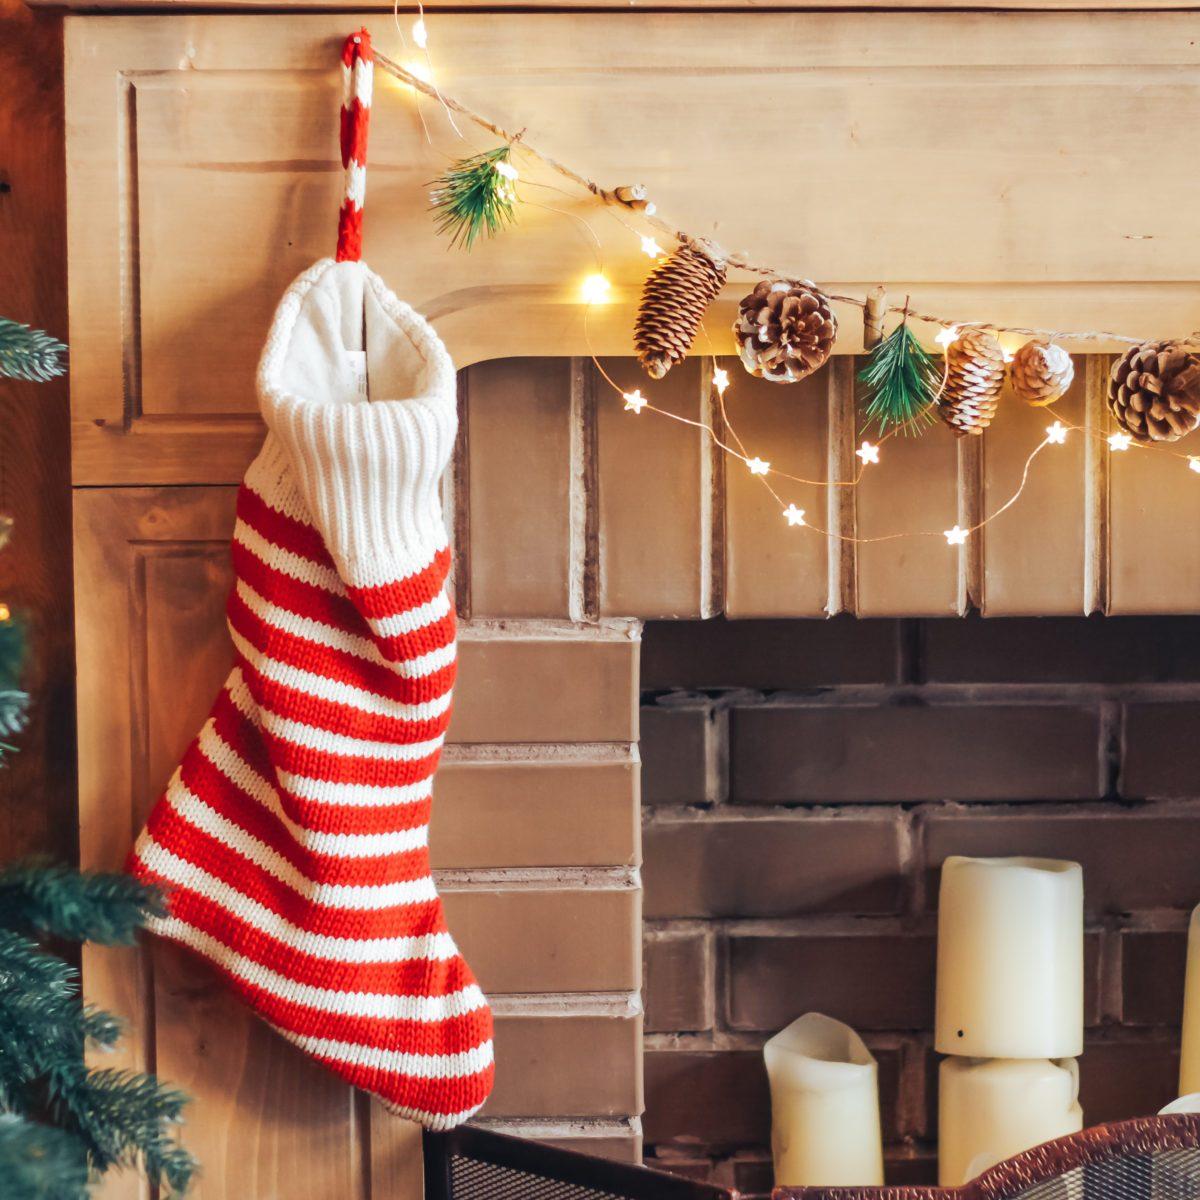 20 Perfect Stocking Stuffers Under $20